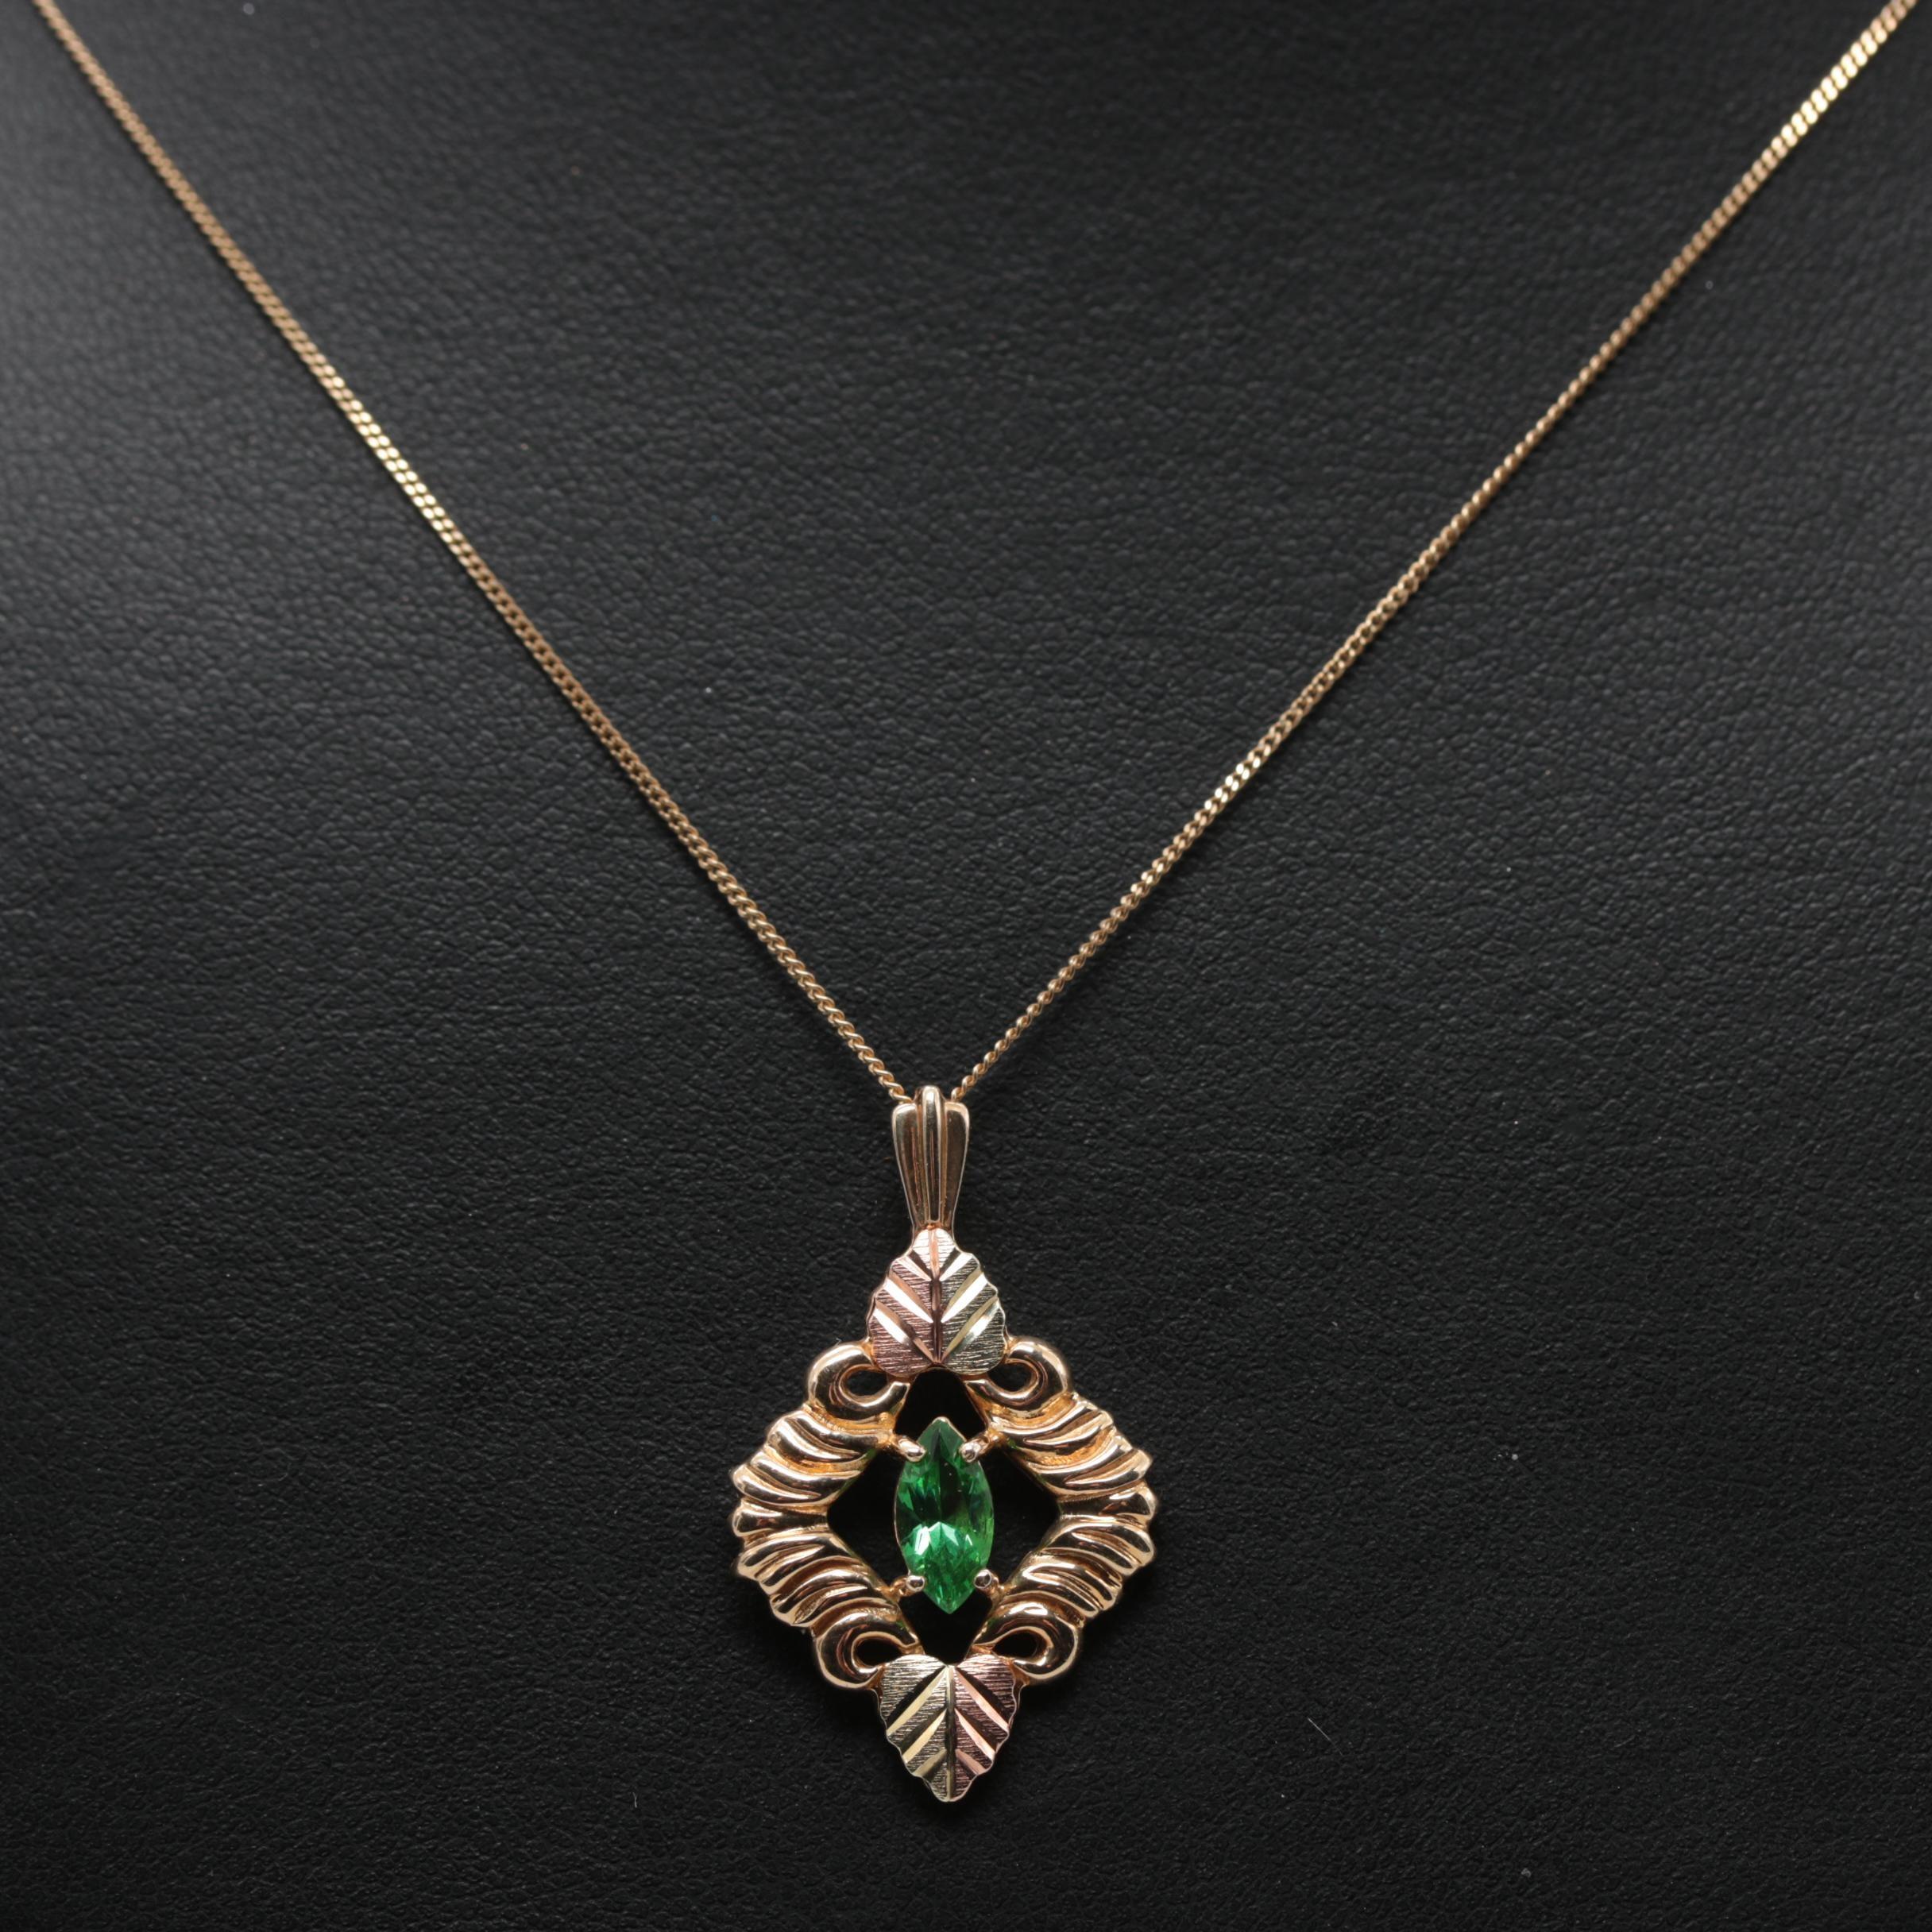 Coleman Co. Black Hills 10K Tri-Color Gold Glass Necklace